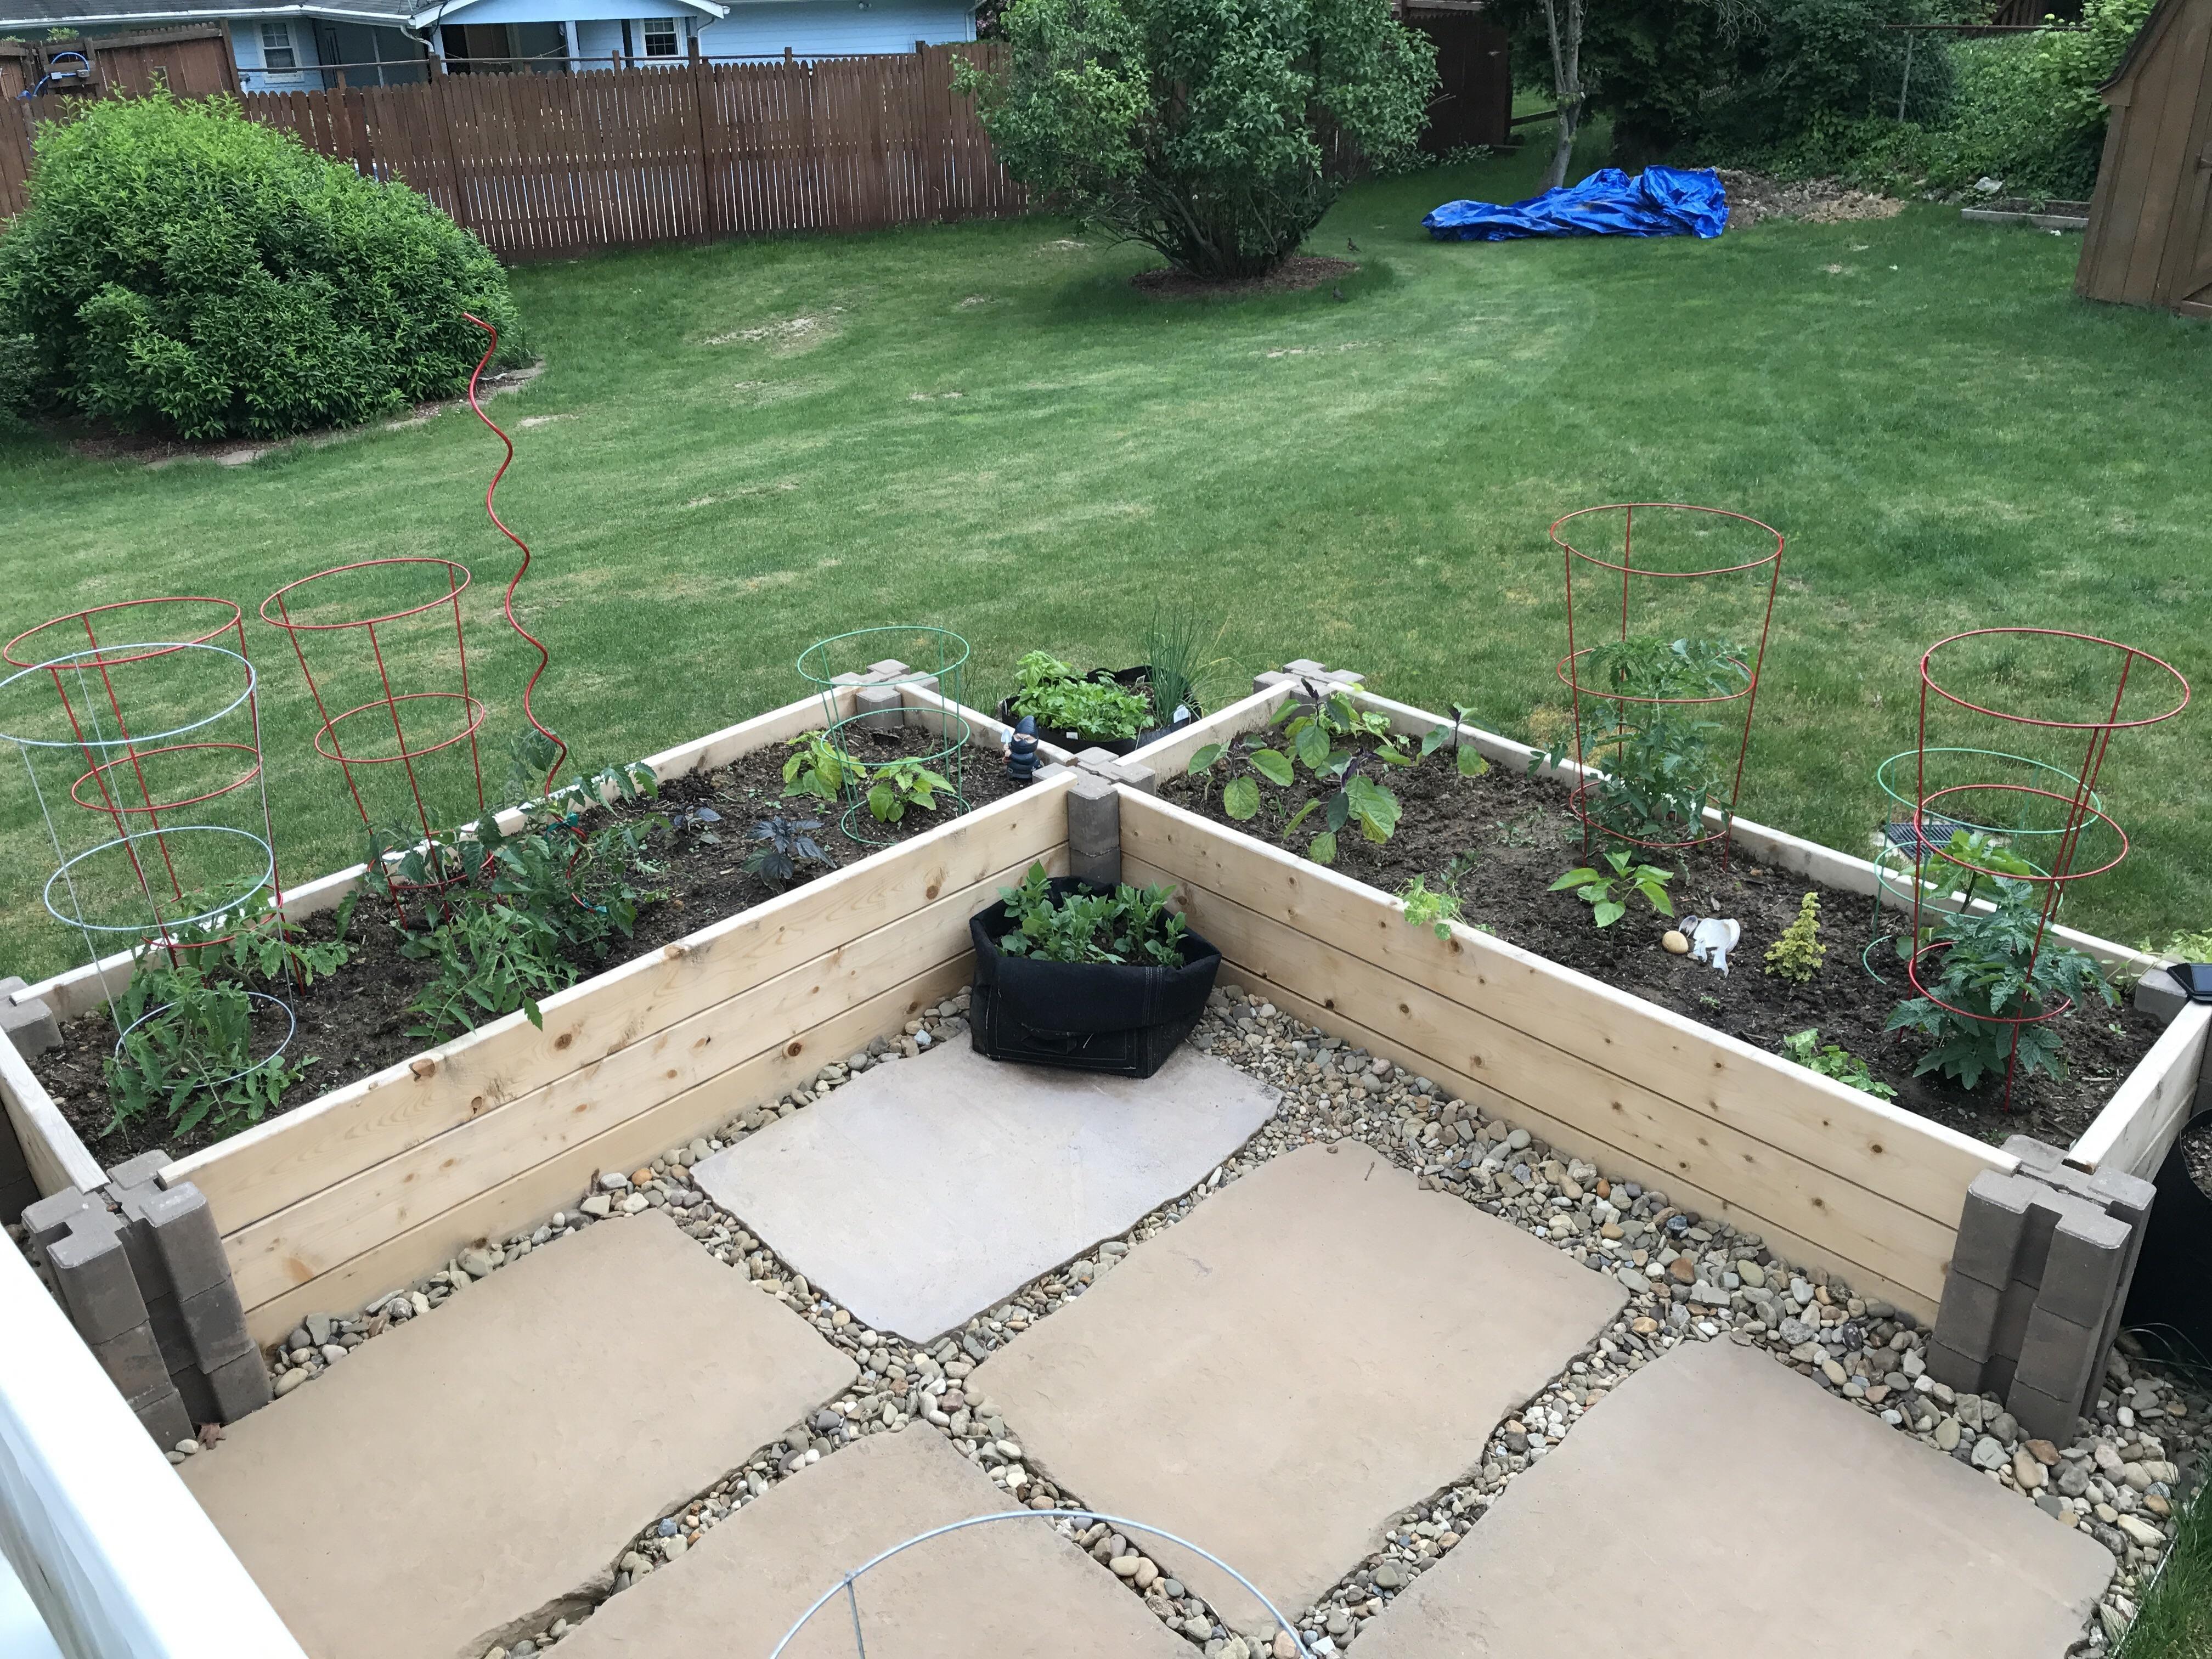 New Raised Beds Using Home Depot Planter Wall Blocks Gardening